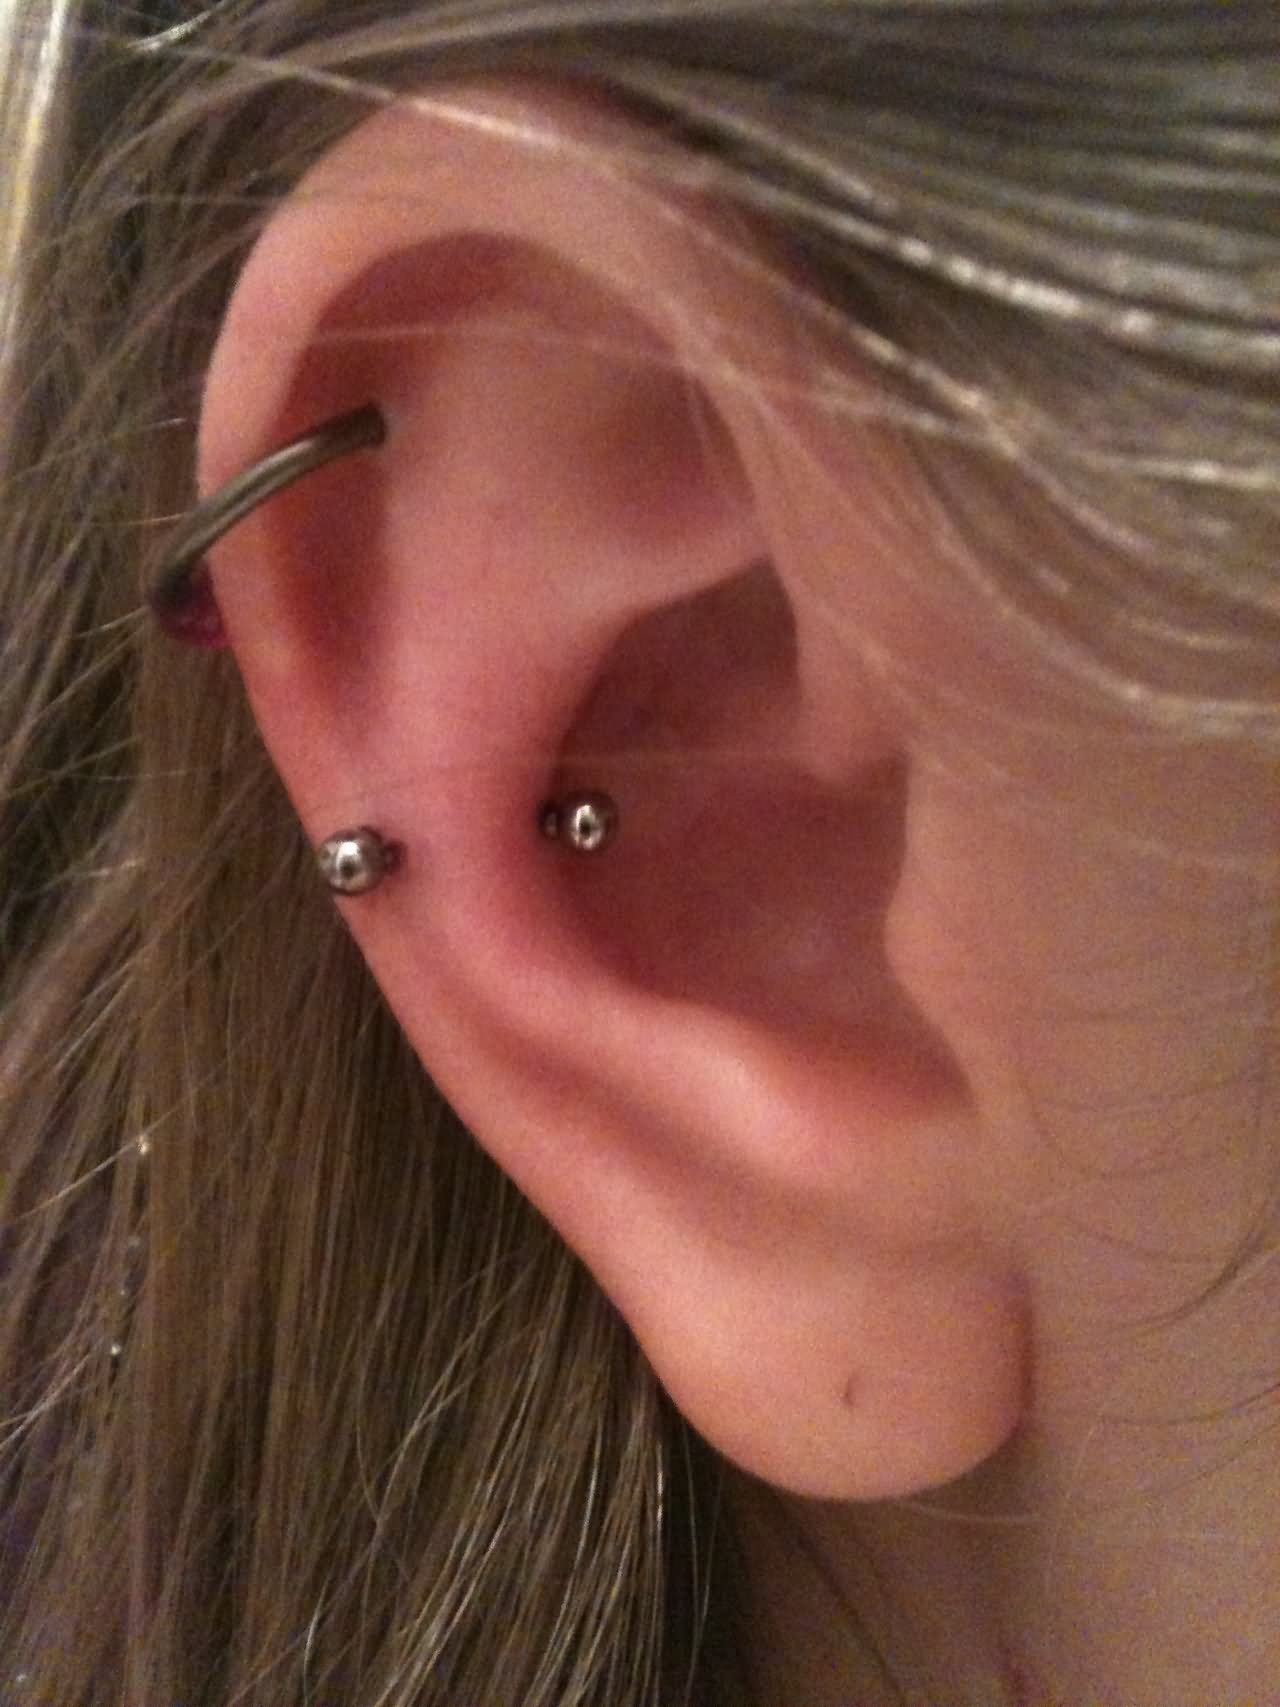 cartilage and snug piercing